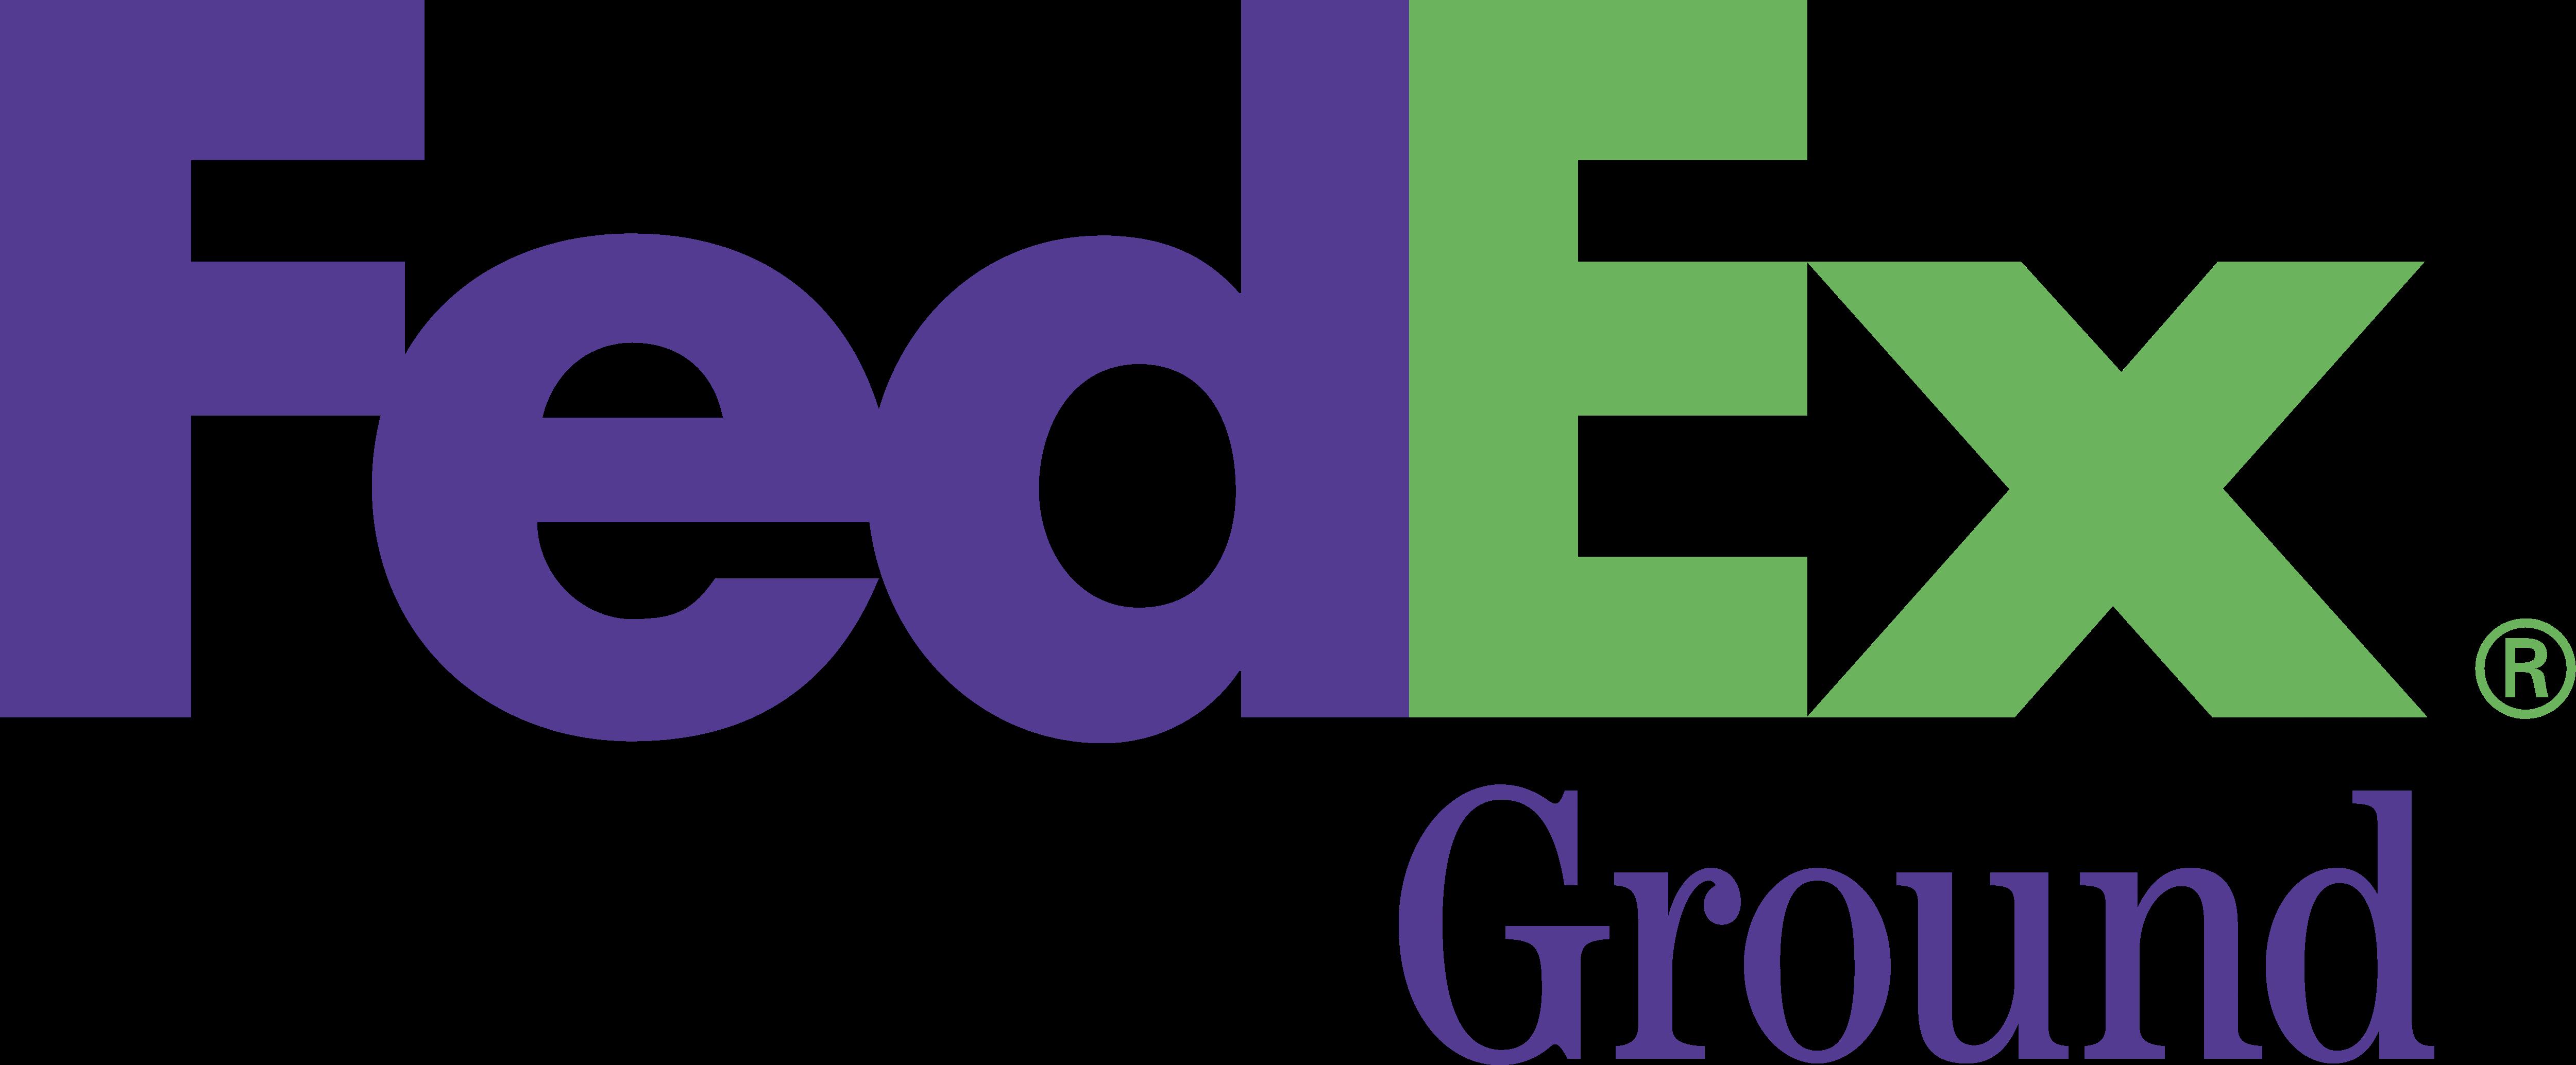 Fedex Ground Logo Png